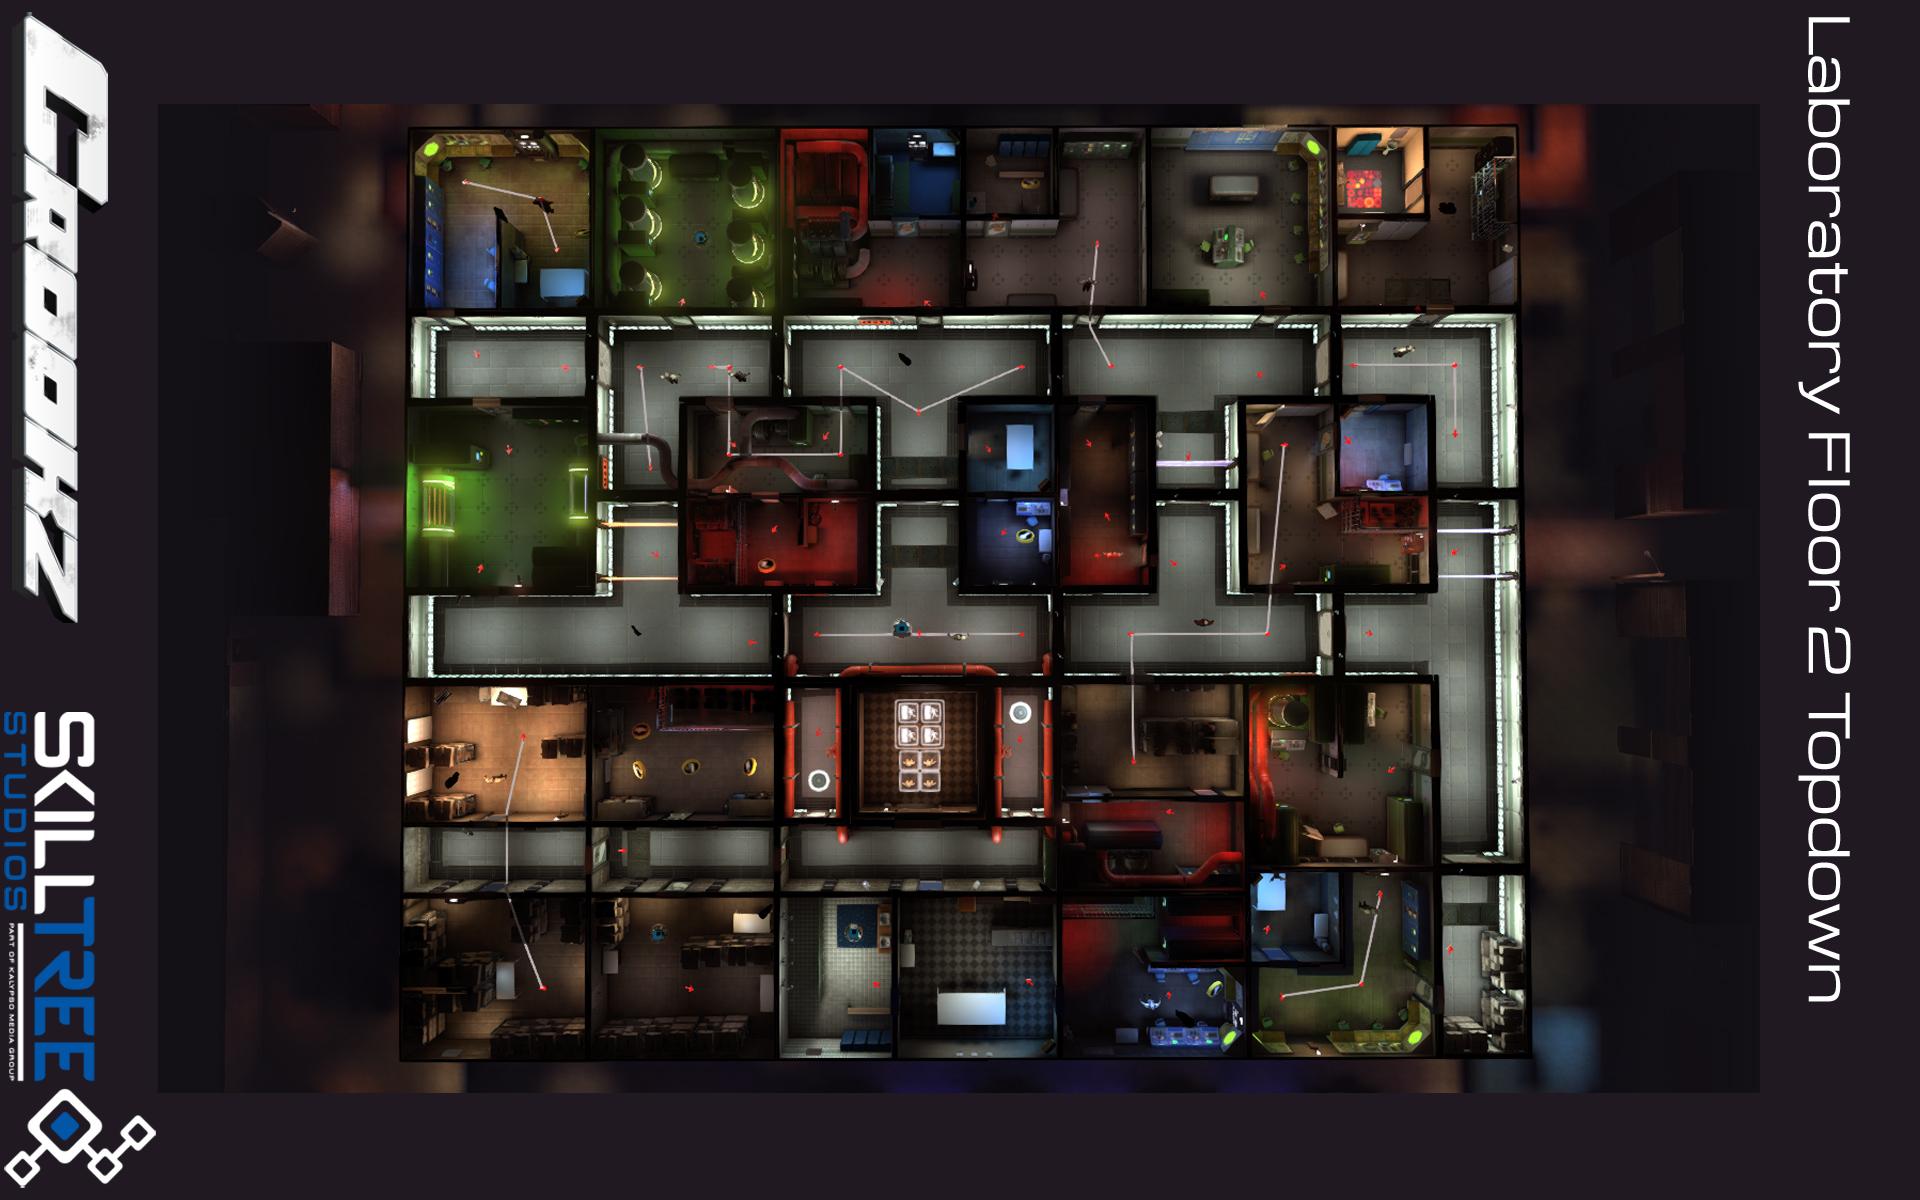 Crookz_Maps_Laboratory_2_topdown